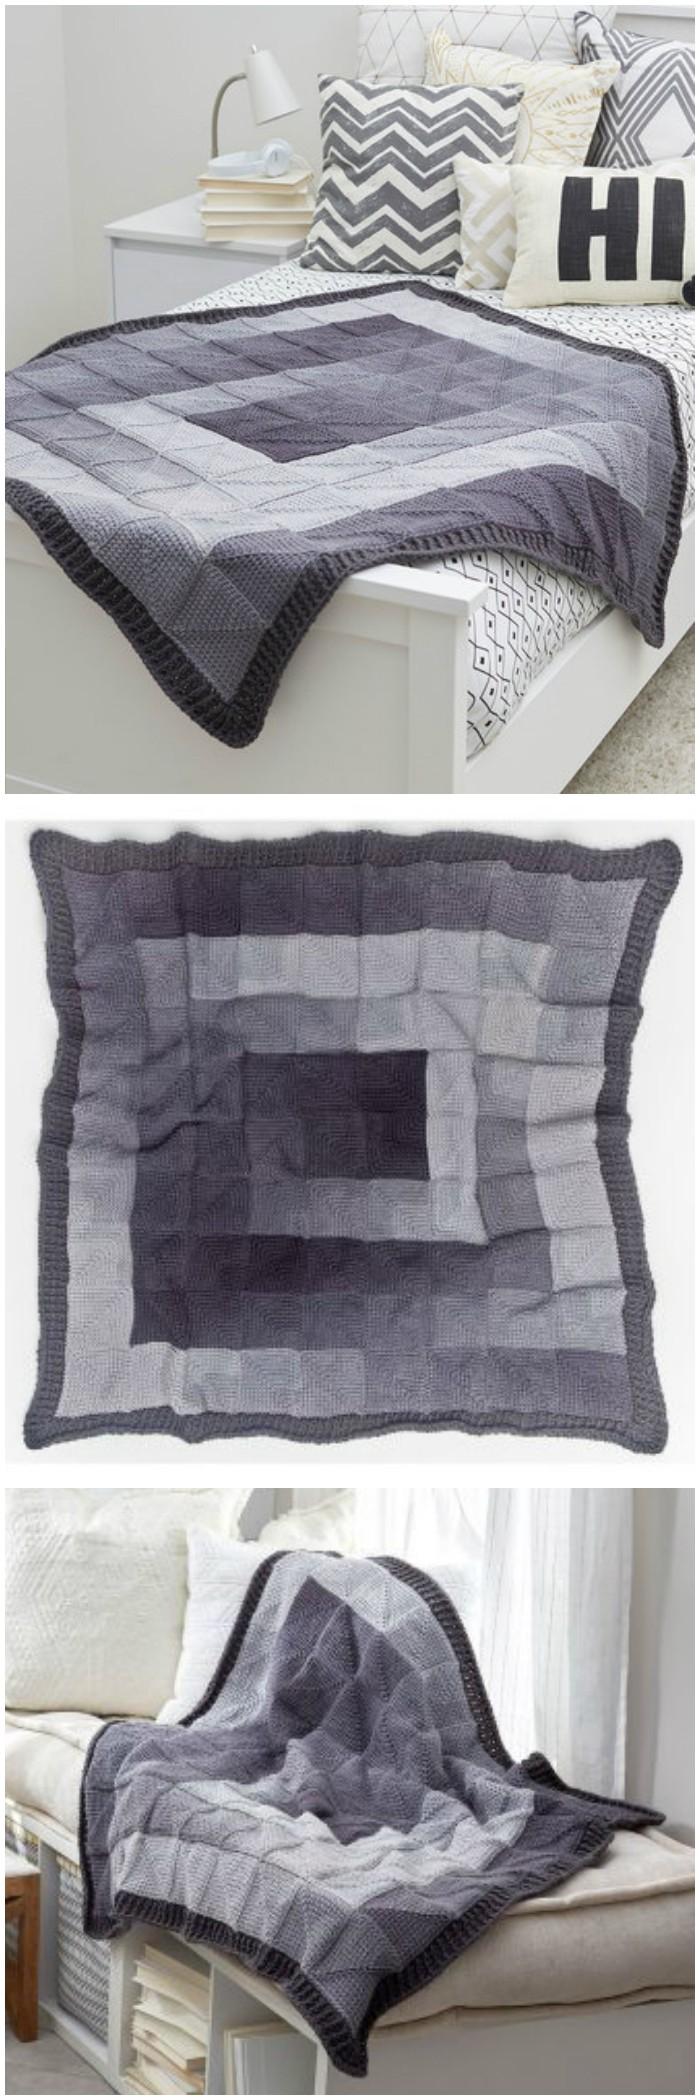 Granny Square Mosaic Ripples Free Crochet Pattern